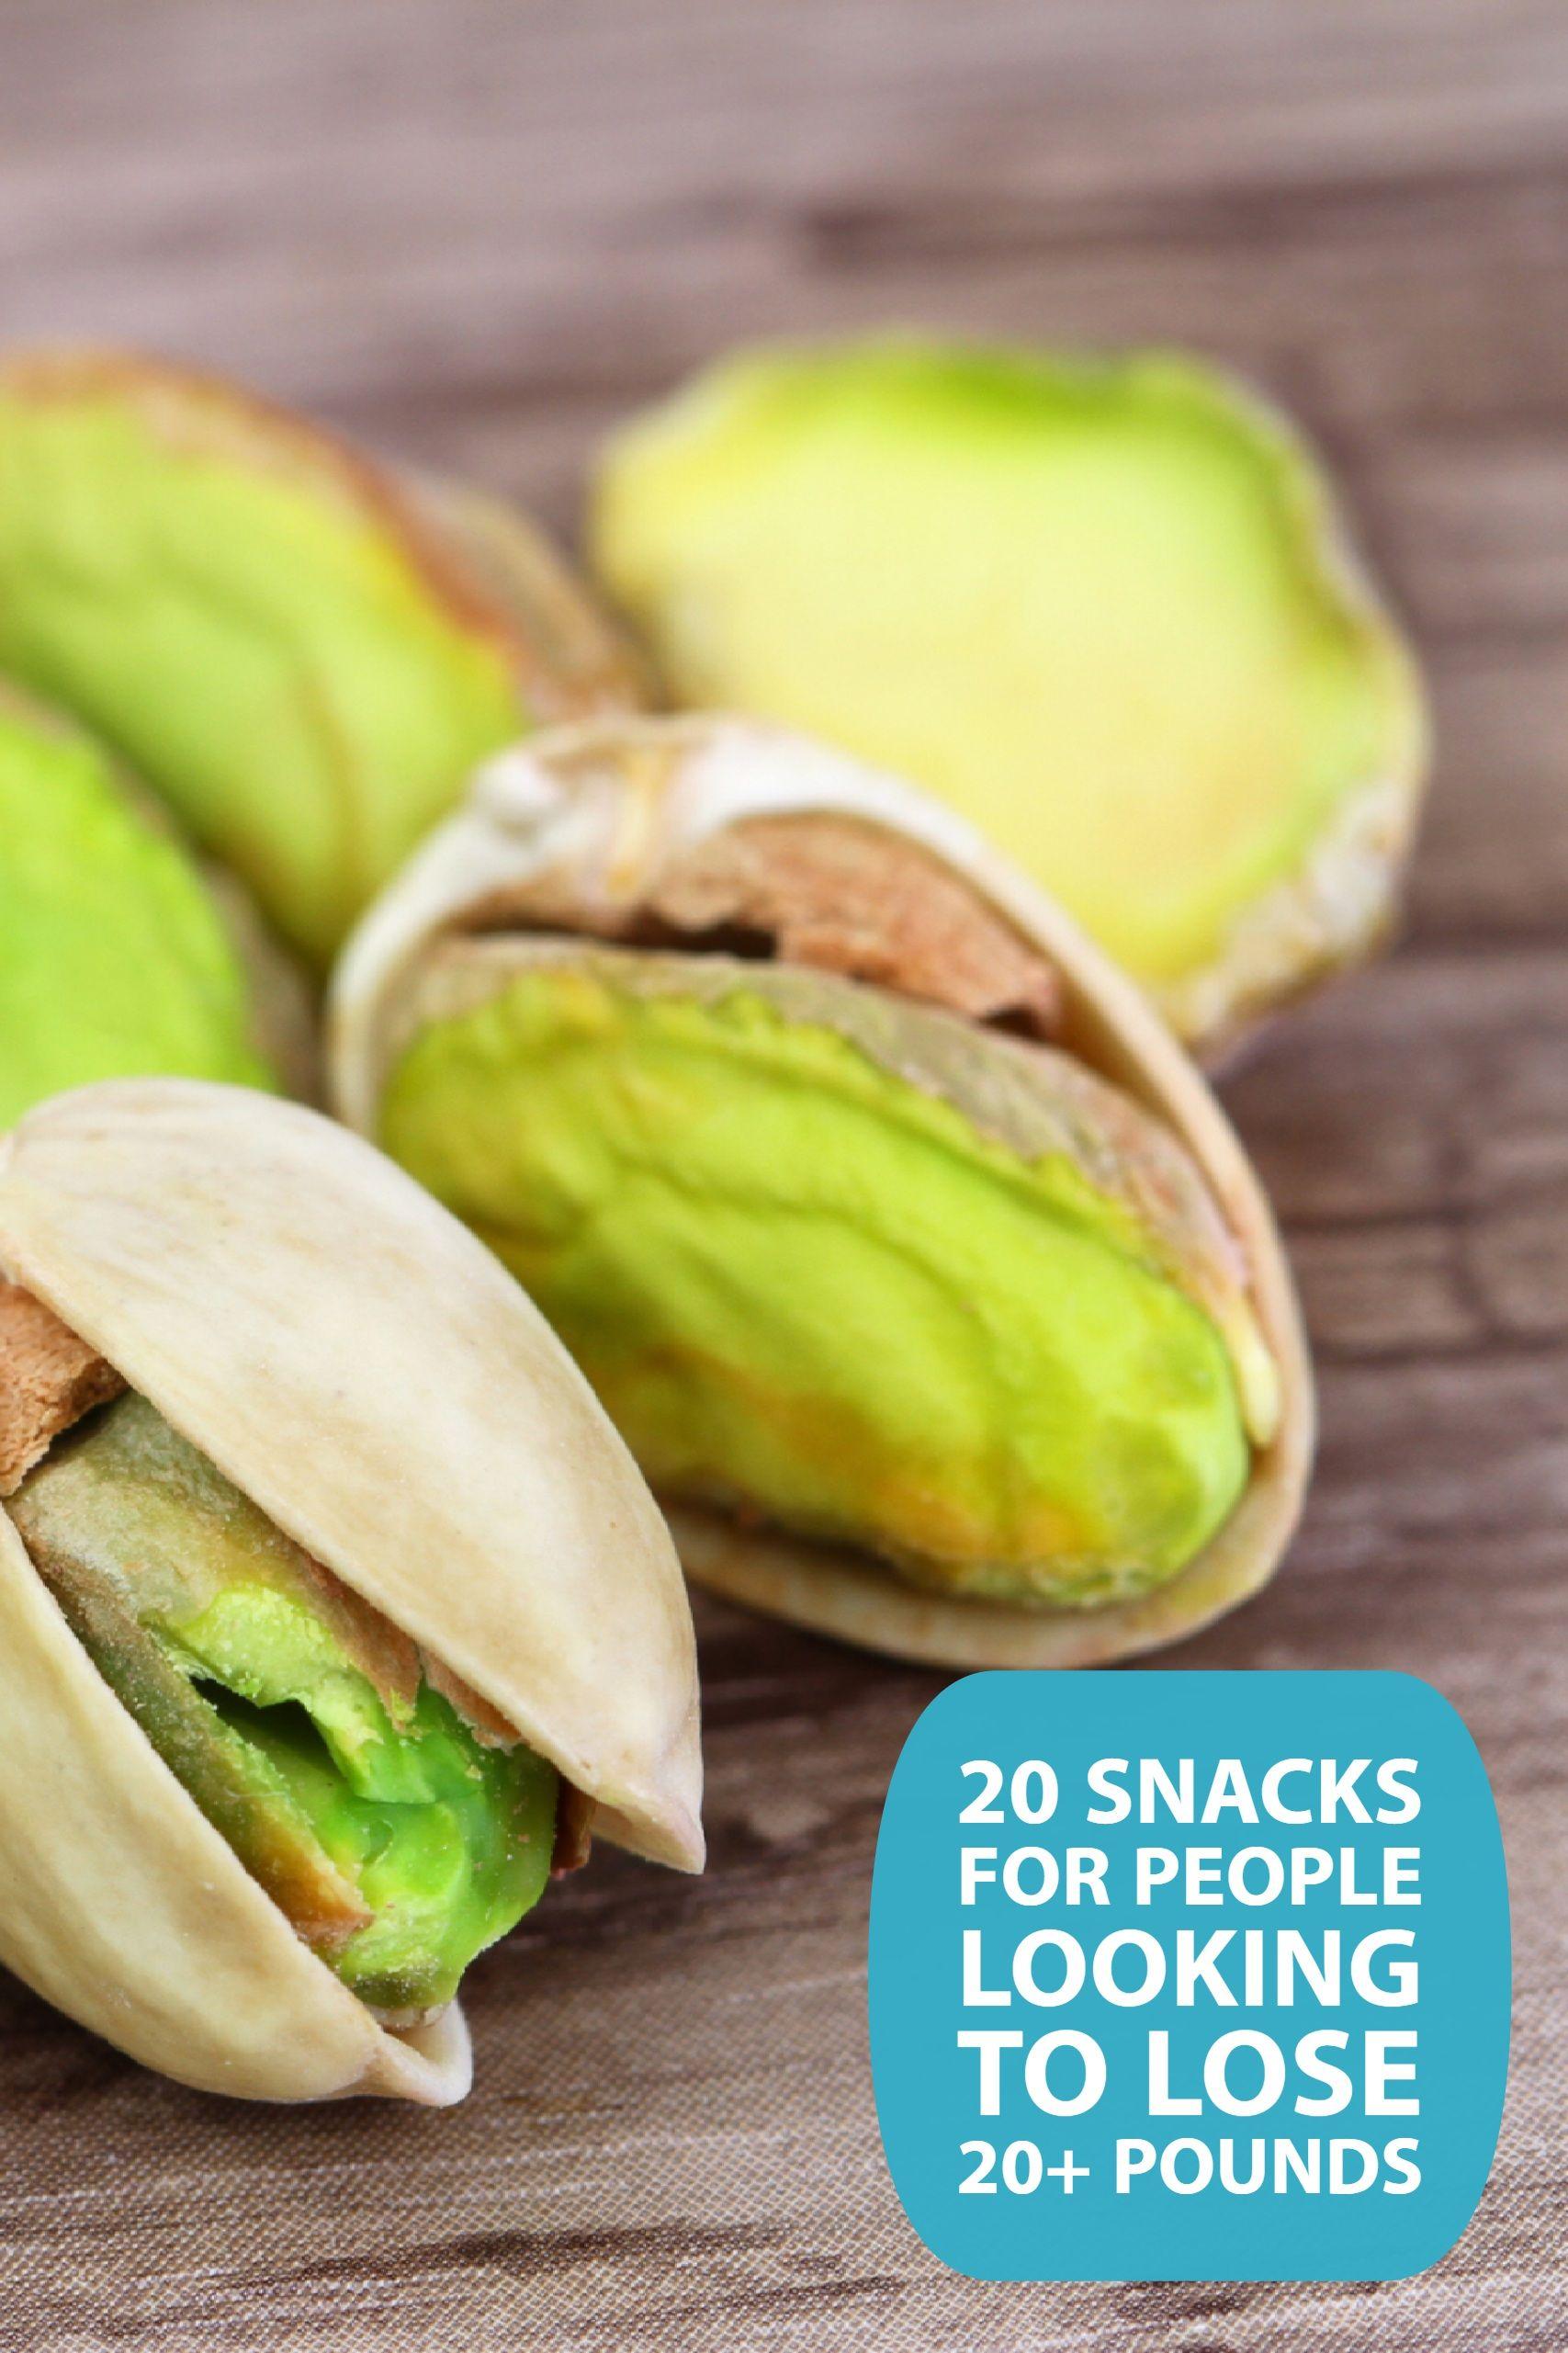 Watch 20 Snacks Under 100 Calories video